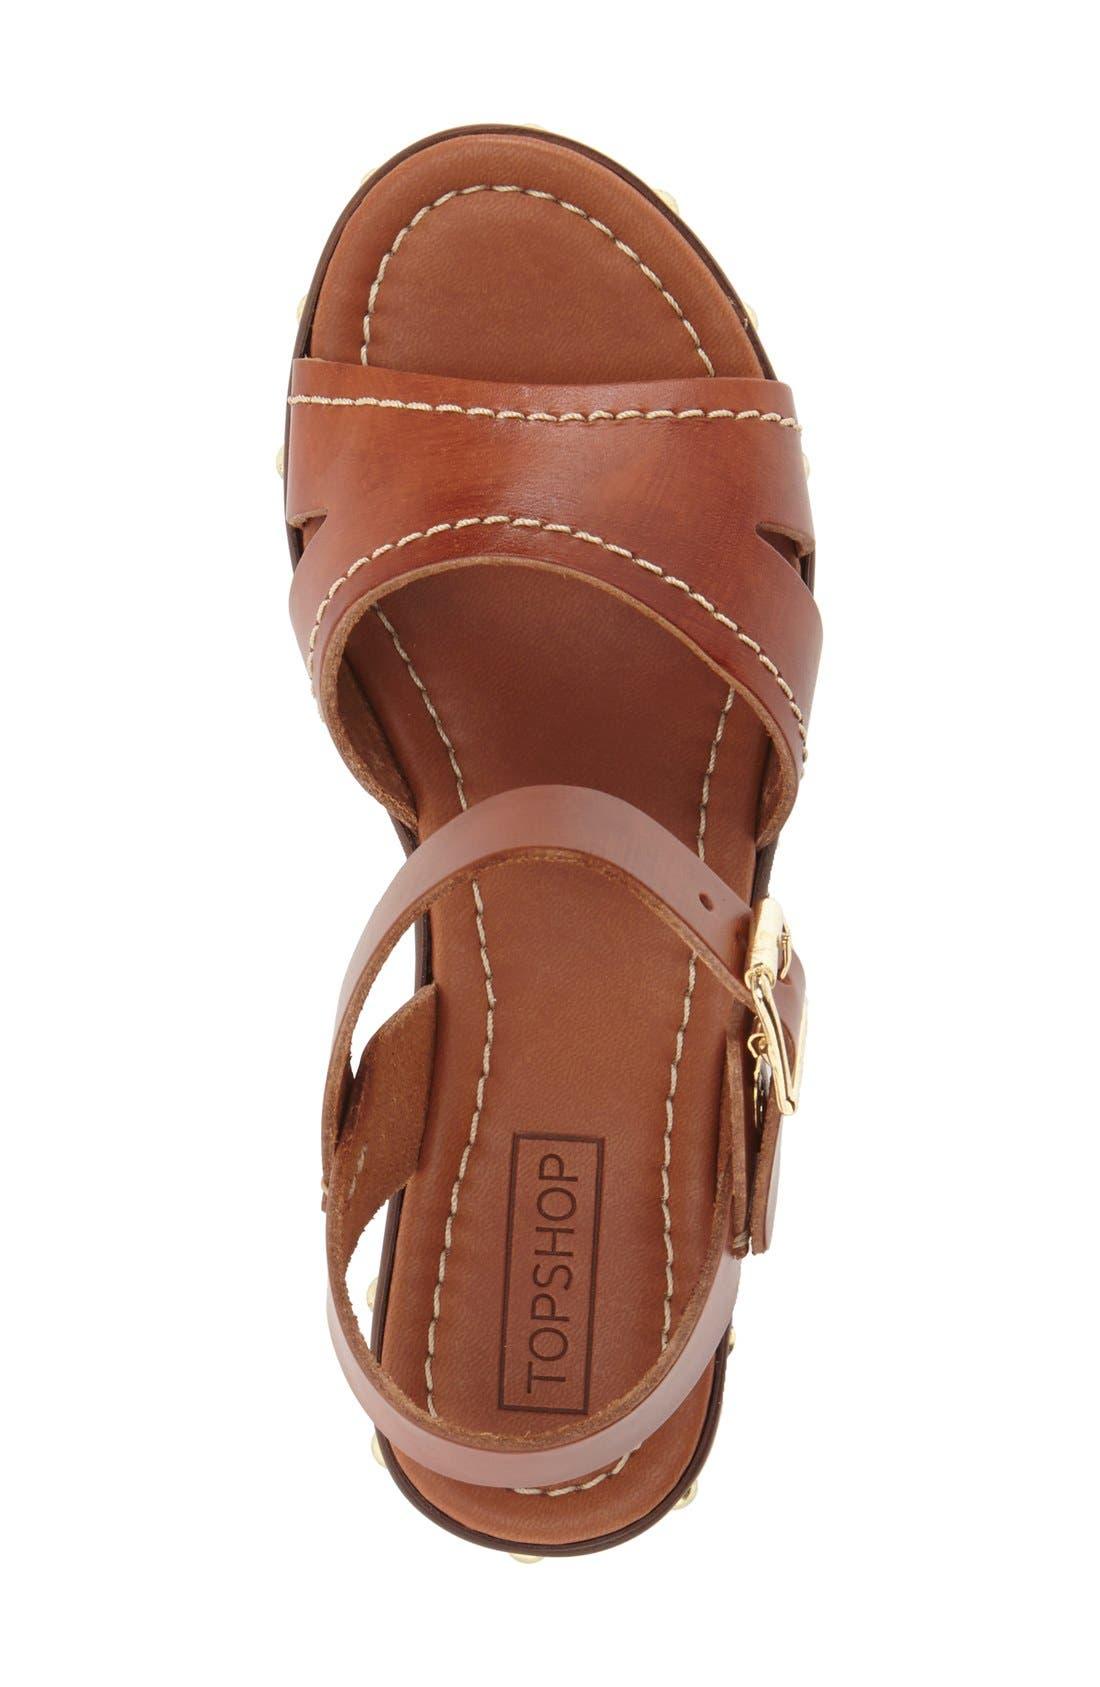 'VIV' Clog Sandals,                             Alternate thumbnail 3, color,                             Tan